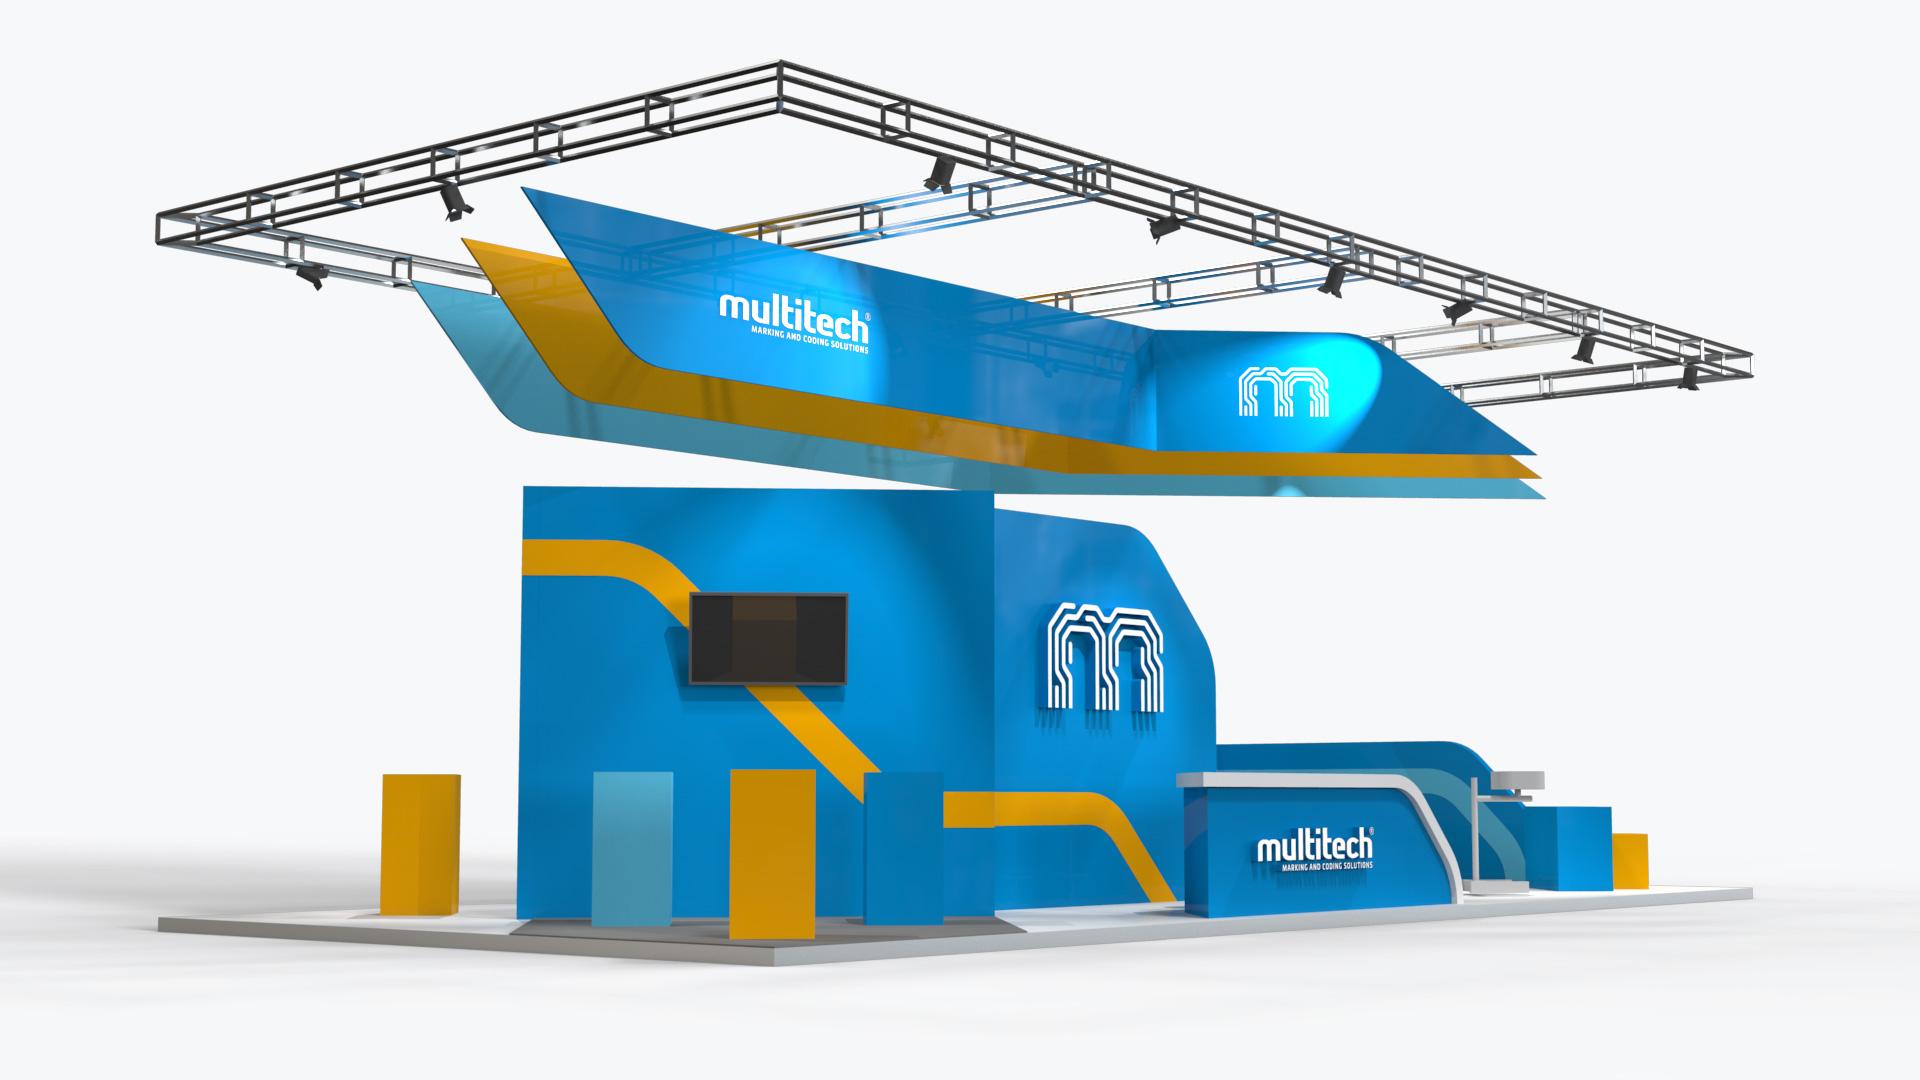 Bisigned-Multitech-Visual-Identity-Booth-Design_3.jpg